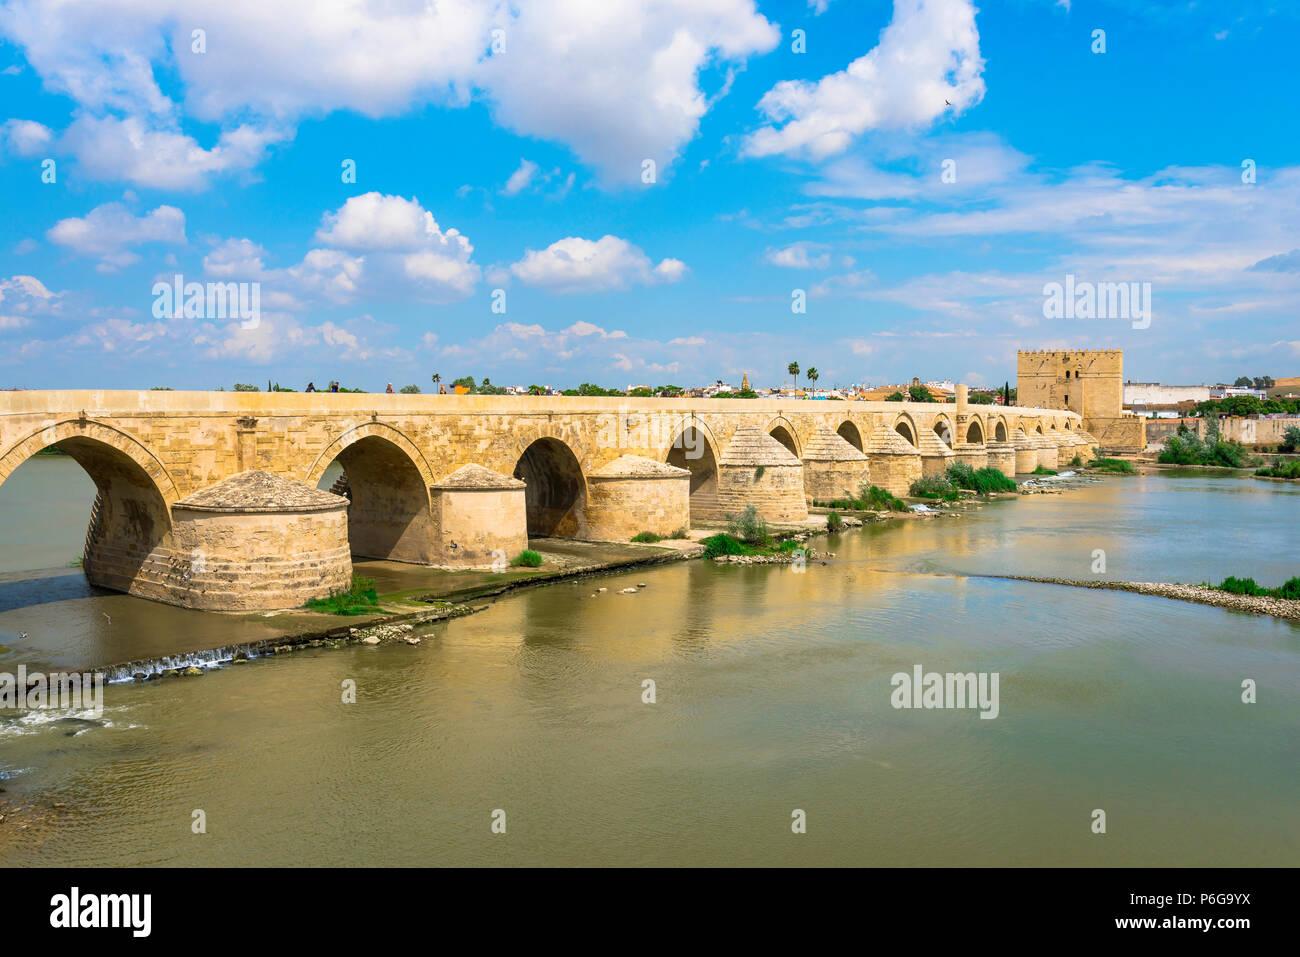 Cordoba bridge, view of the historic Roman Bridge spanning the Rio Guadalquivir in Cordoba (Cordova) Andalucia, Spain. - Stock Image